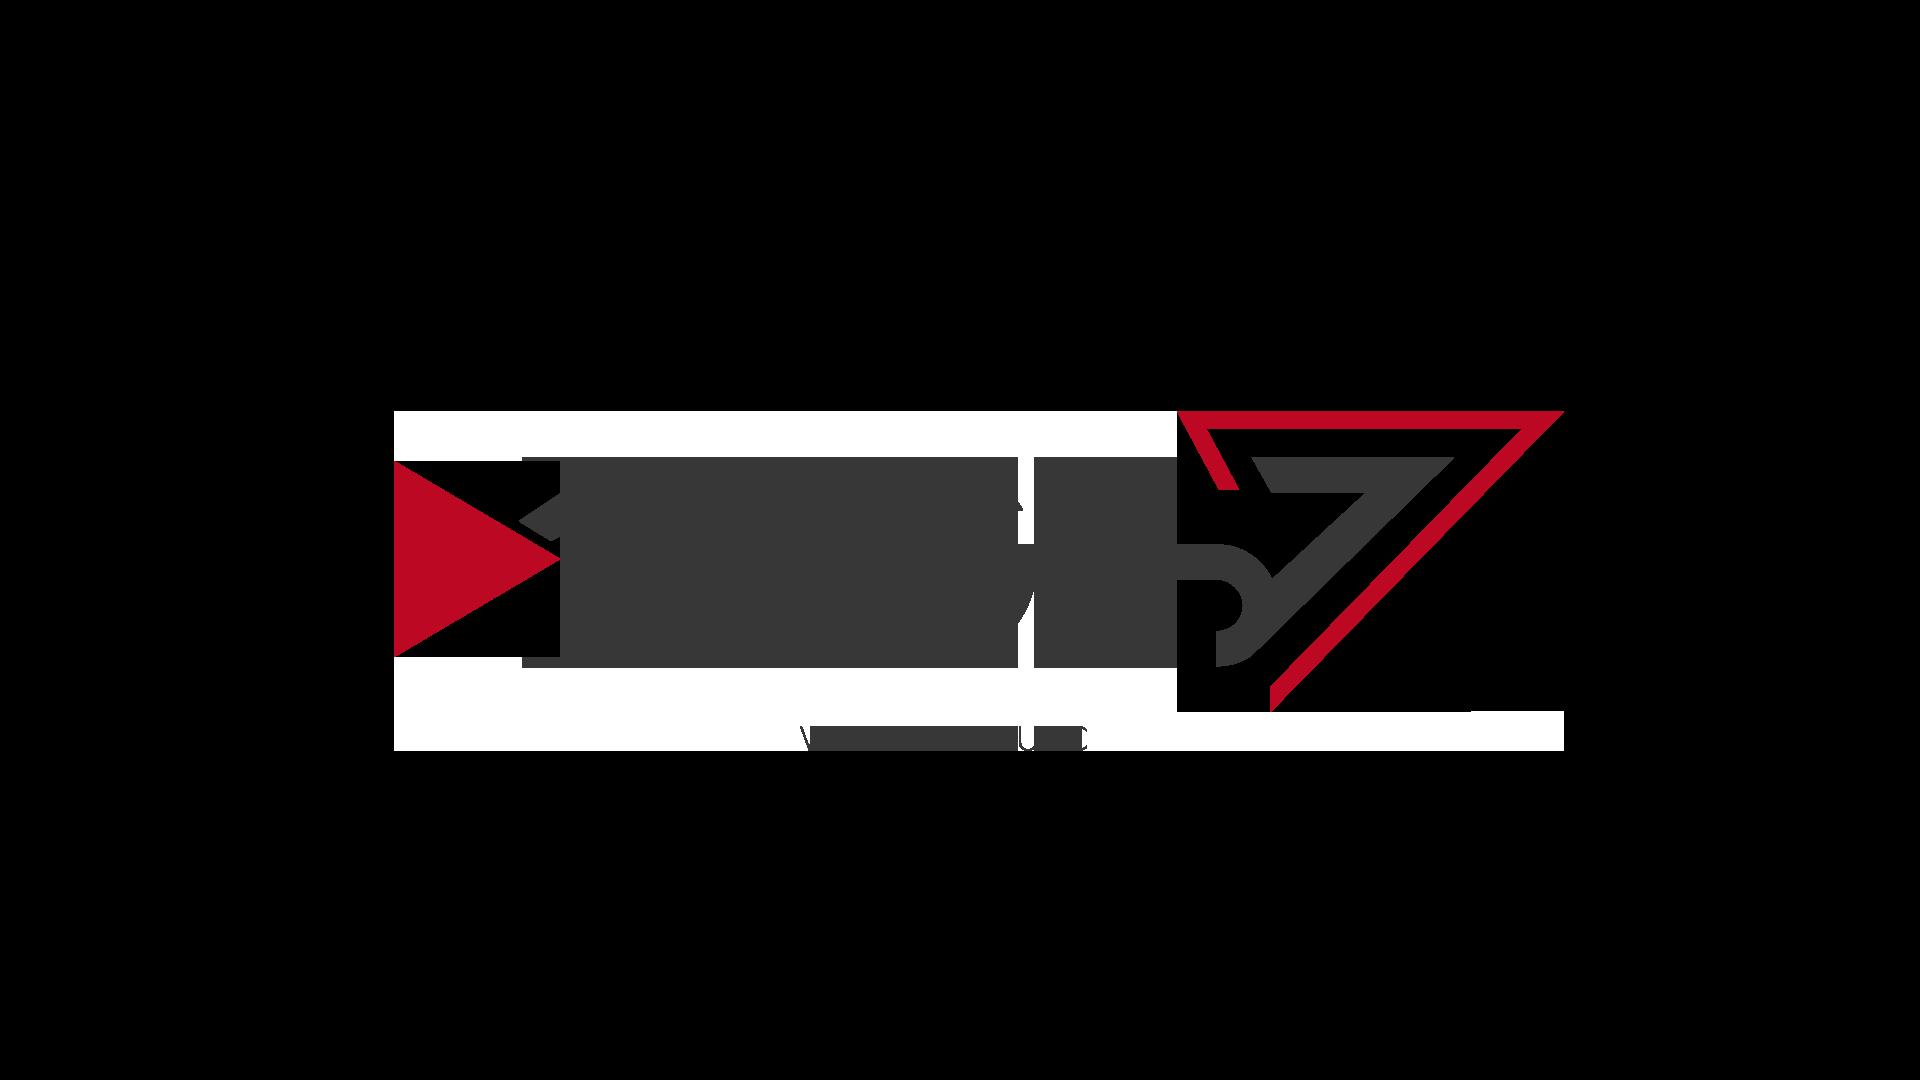 Edicion Aular - Digital Agency - Agencia Digital - Web design - Diseño Web - Diseño digital - SEO